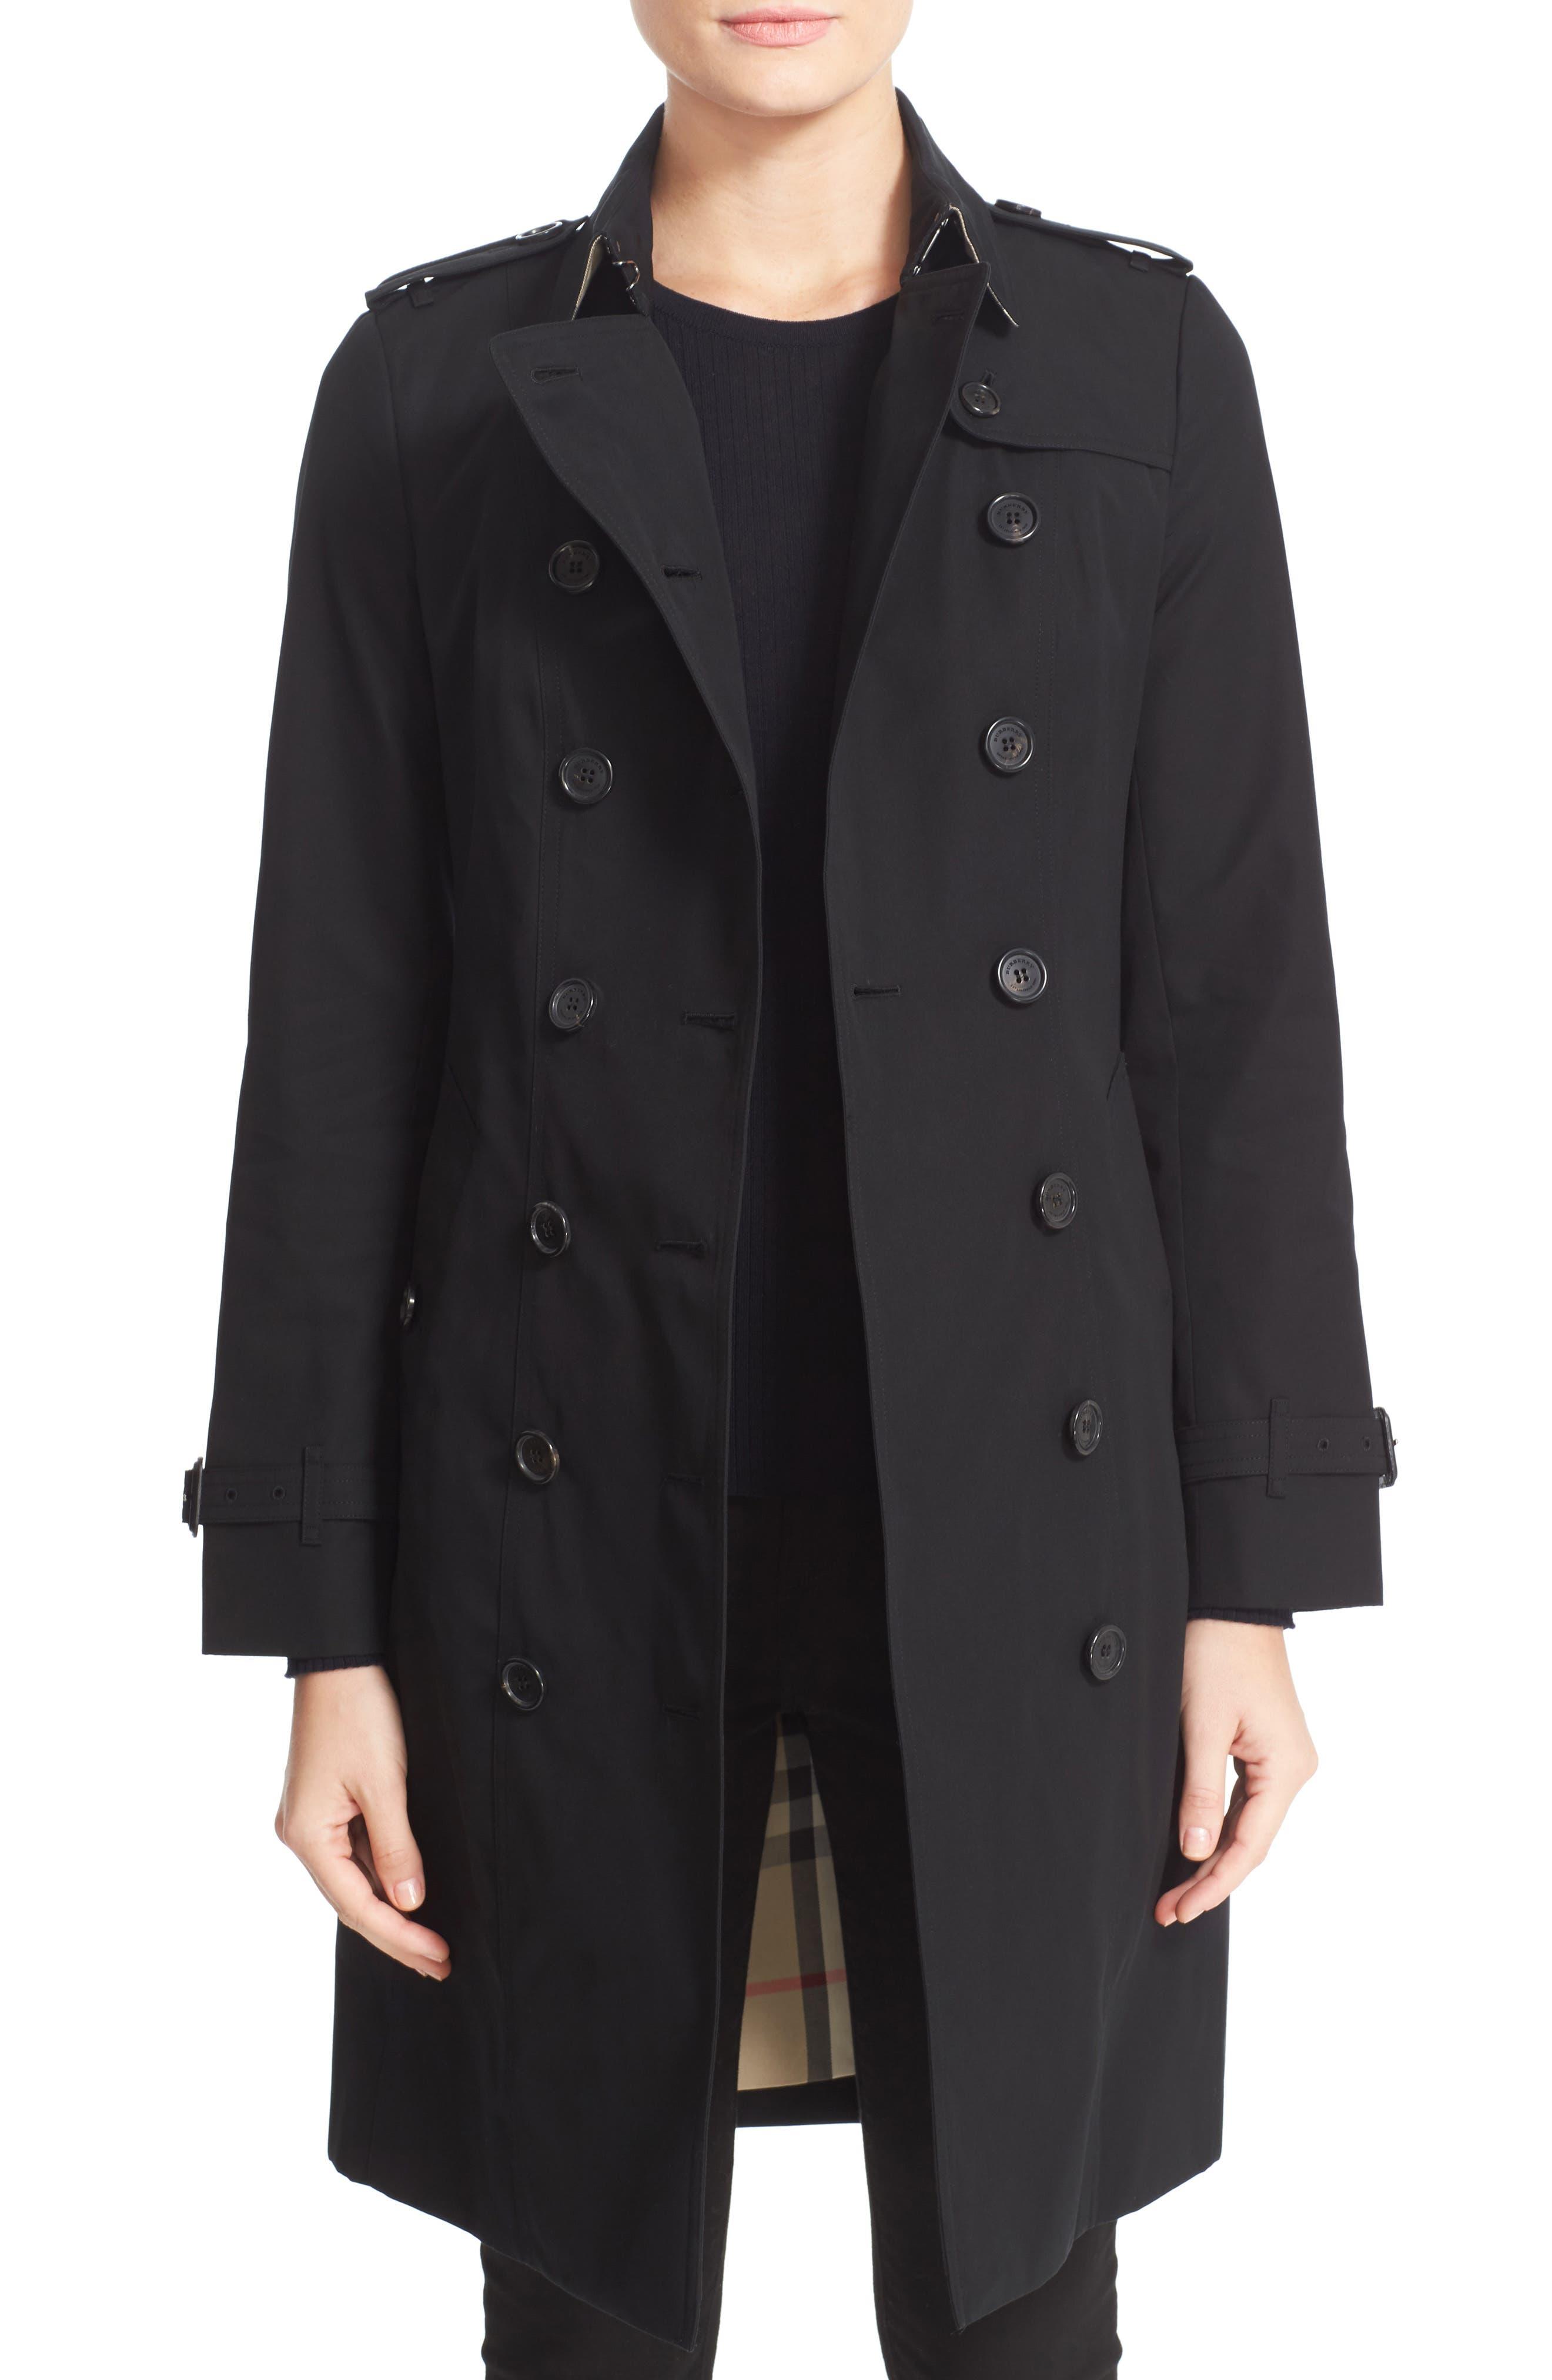 Burberry Womens Outerwear Coats Jackets